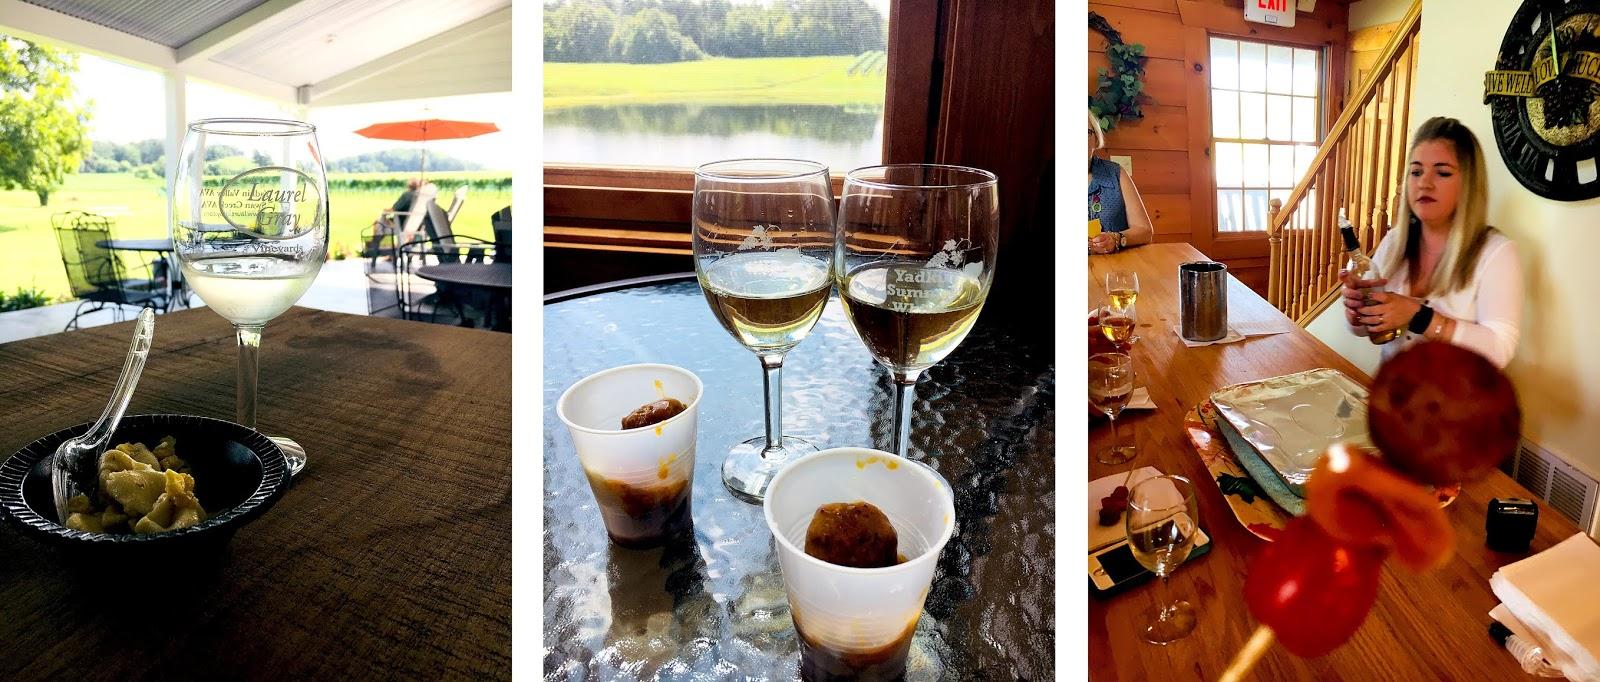 Pairing up wines at Laurel Gray, Shadow Springs and Windsor Run Cellars.